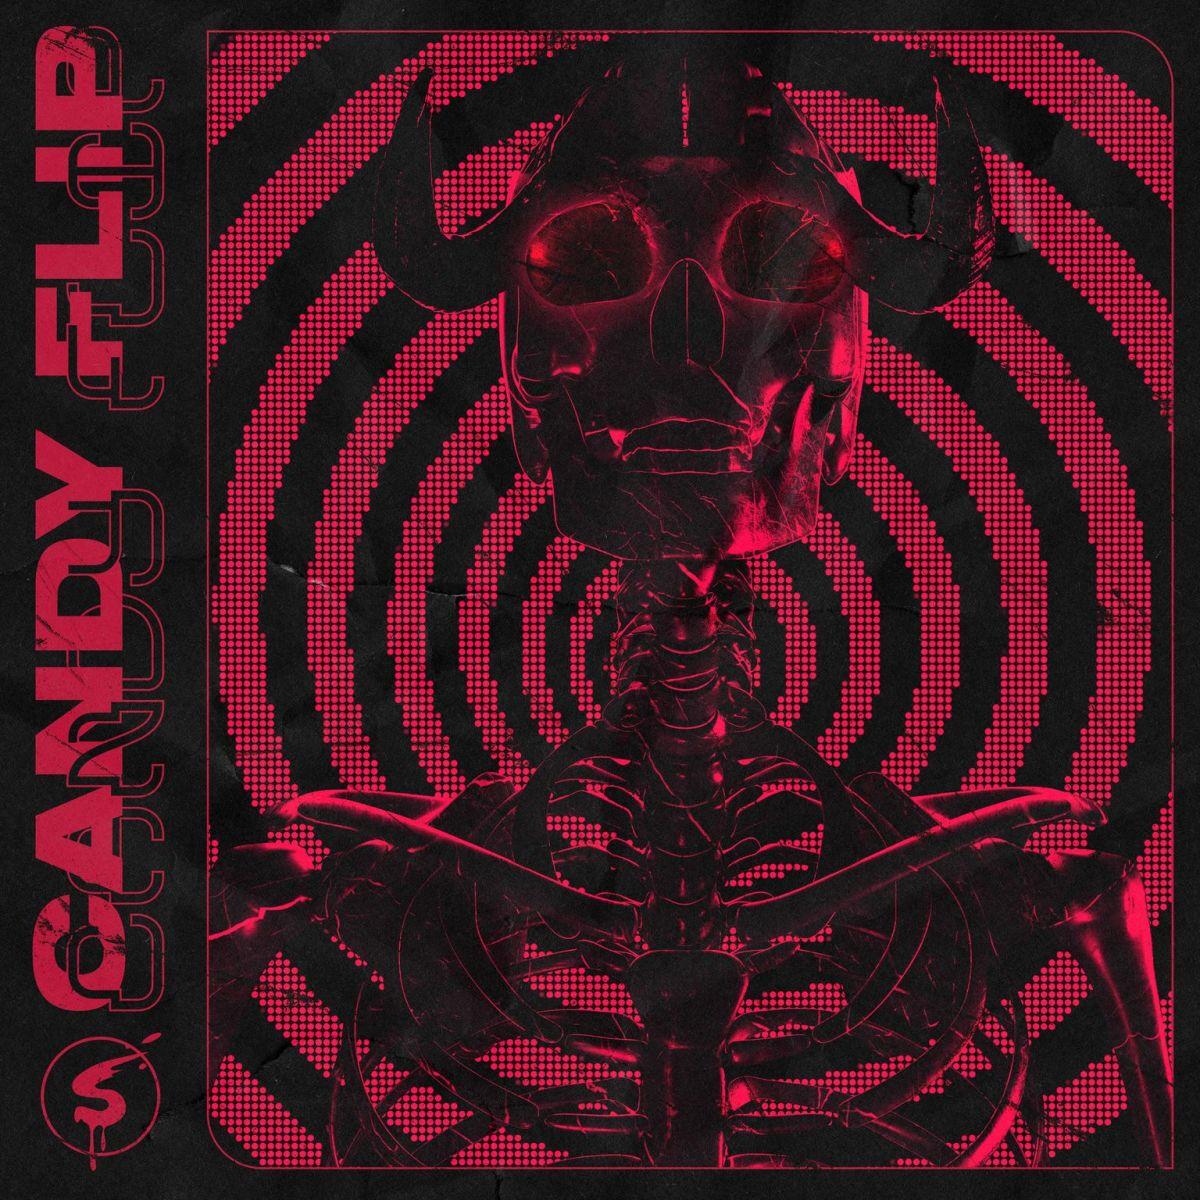 Candy Flip Album Art